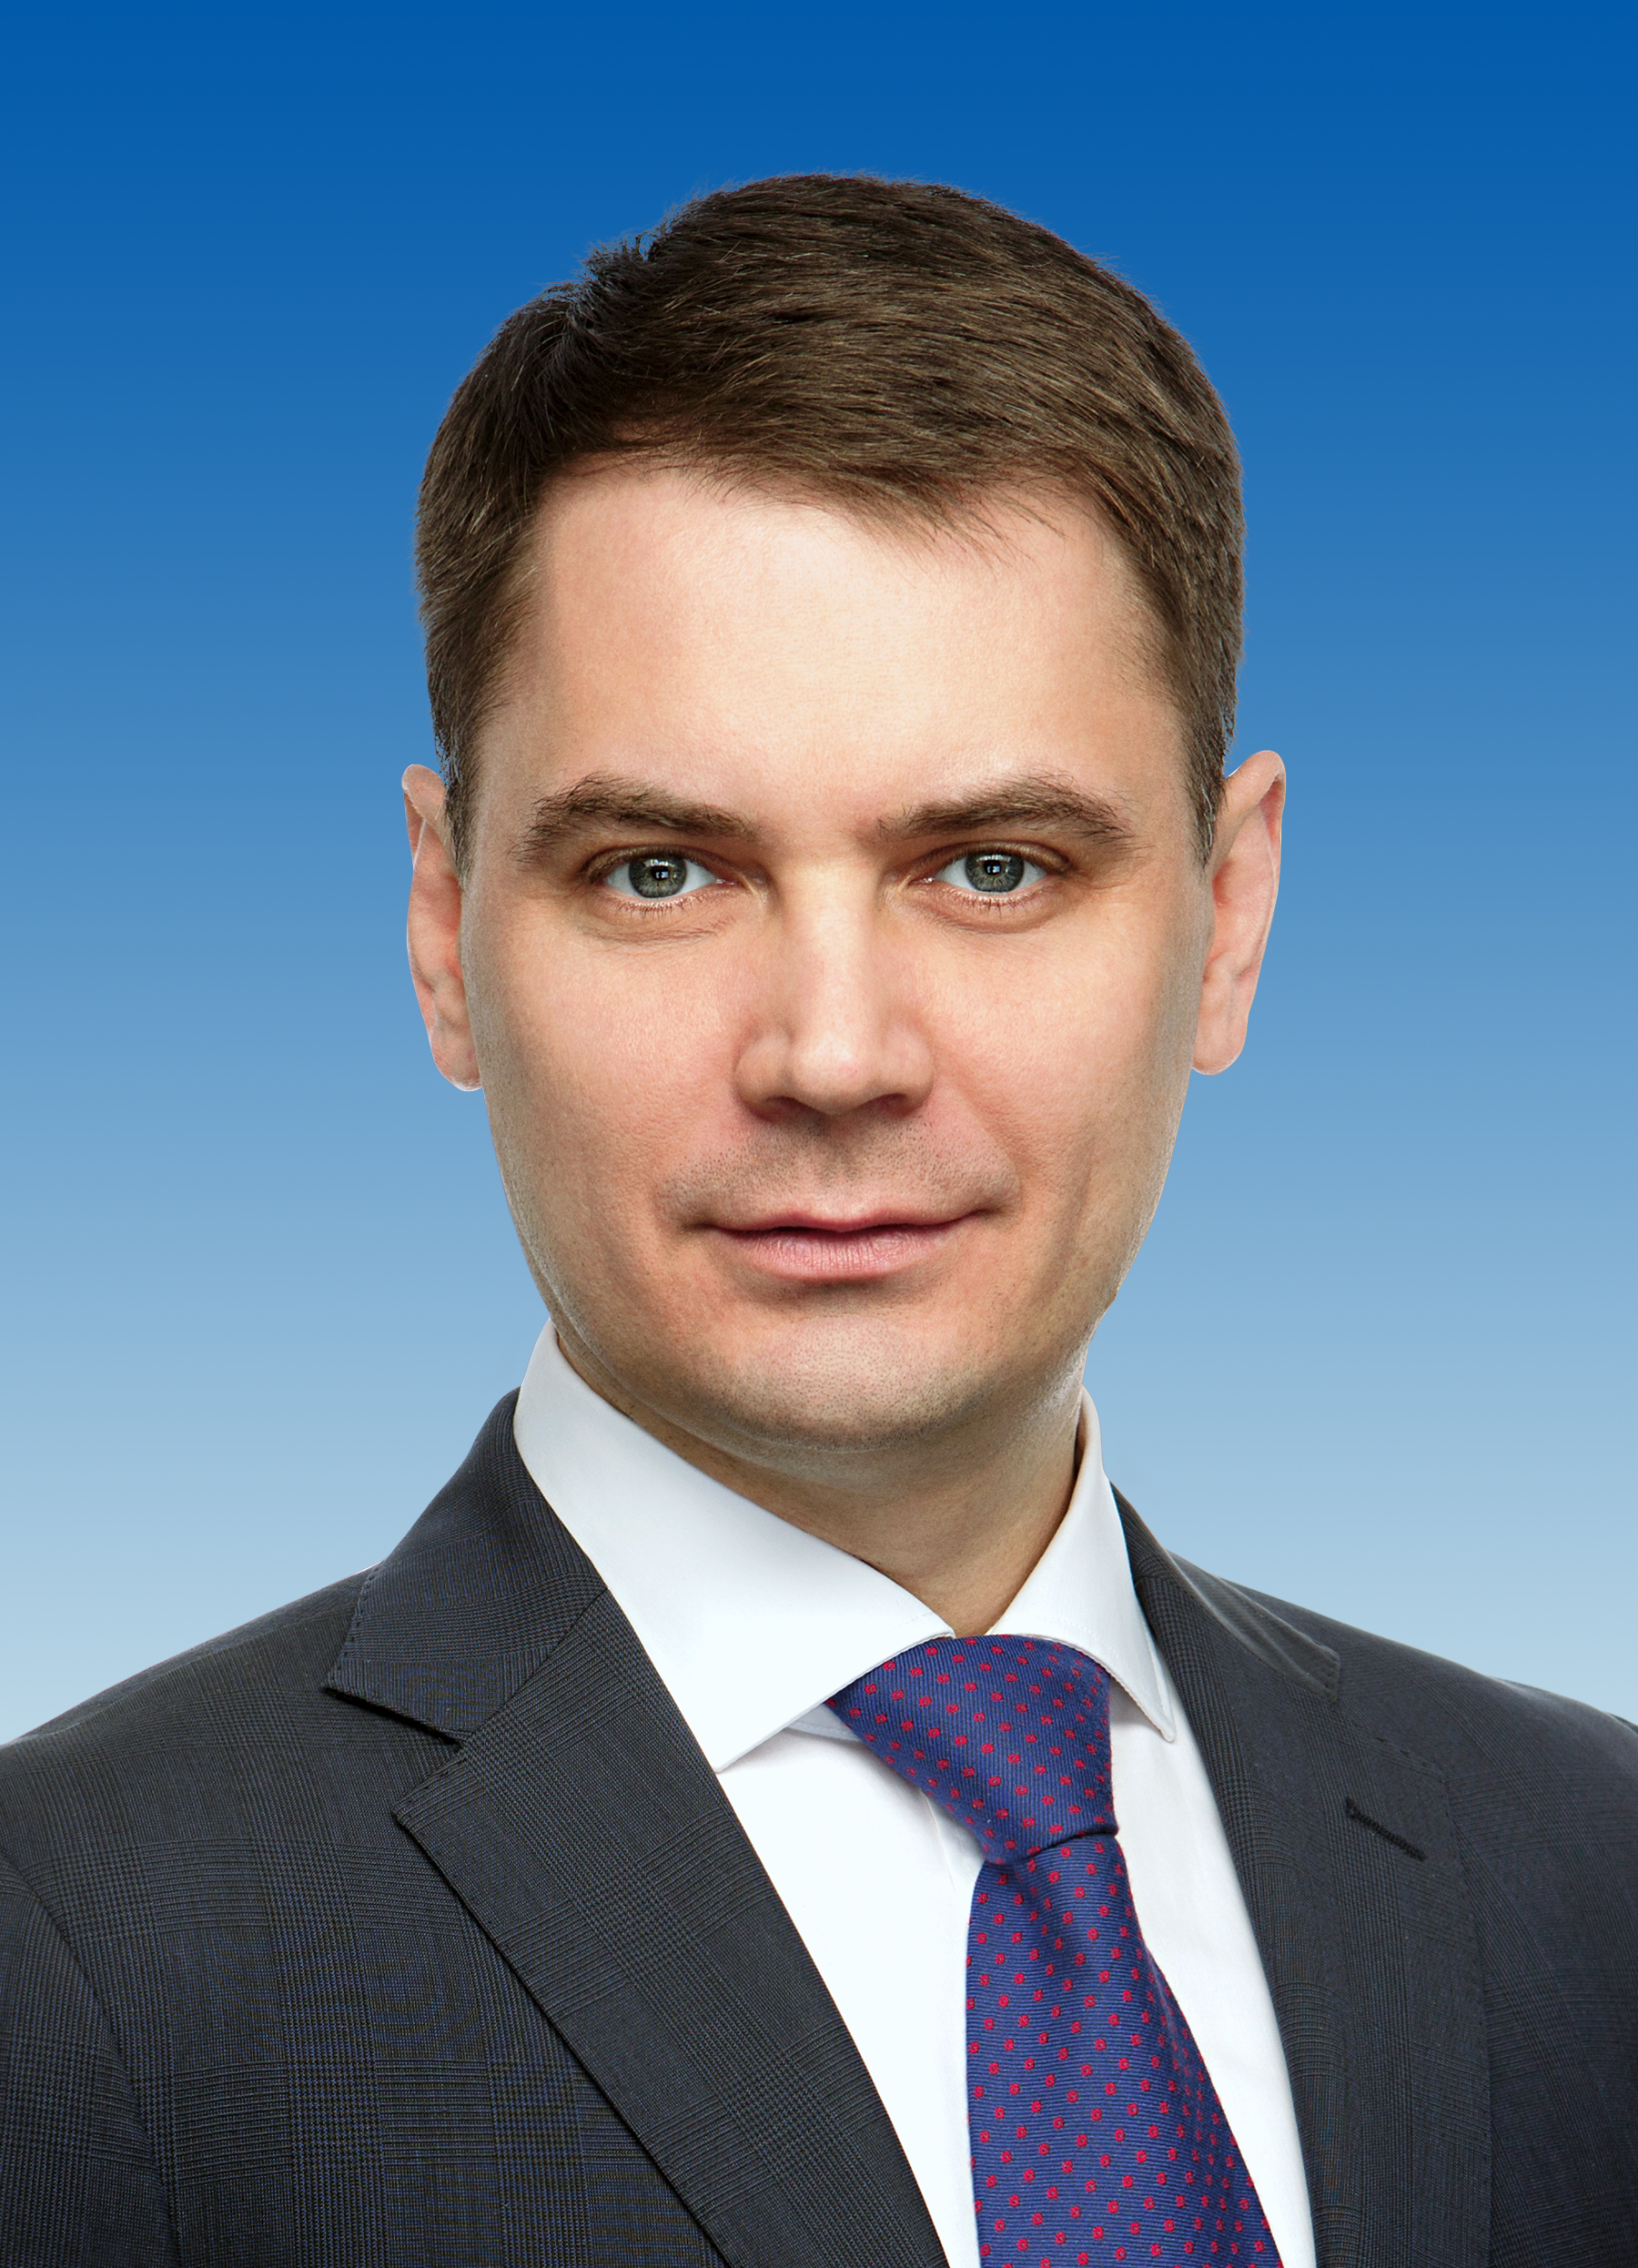 Информация о Корниенко Алексее Викторовиче